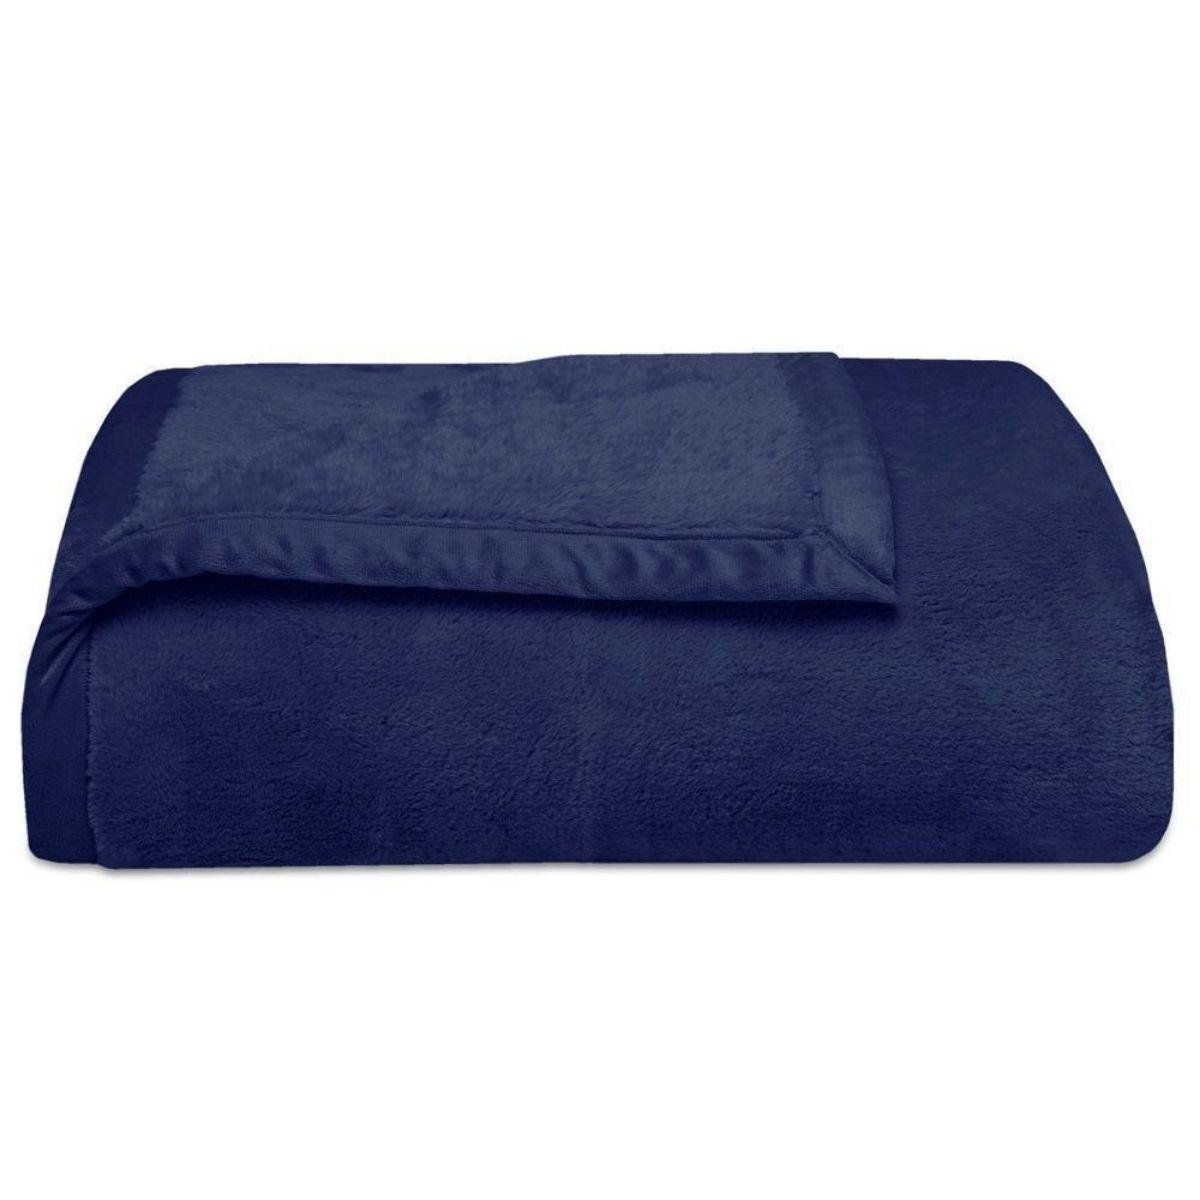 Cobertor King Soft Premium 240x260cm 480g/m²